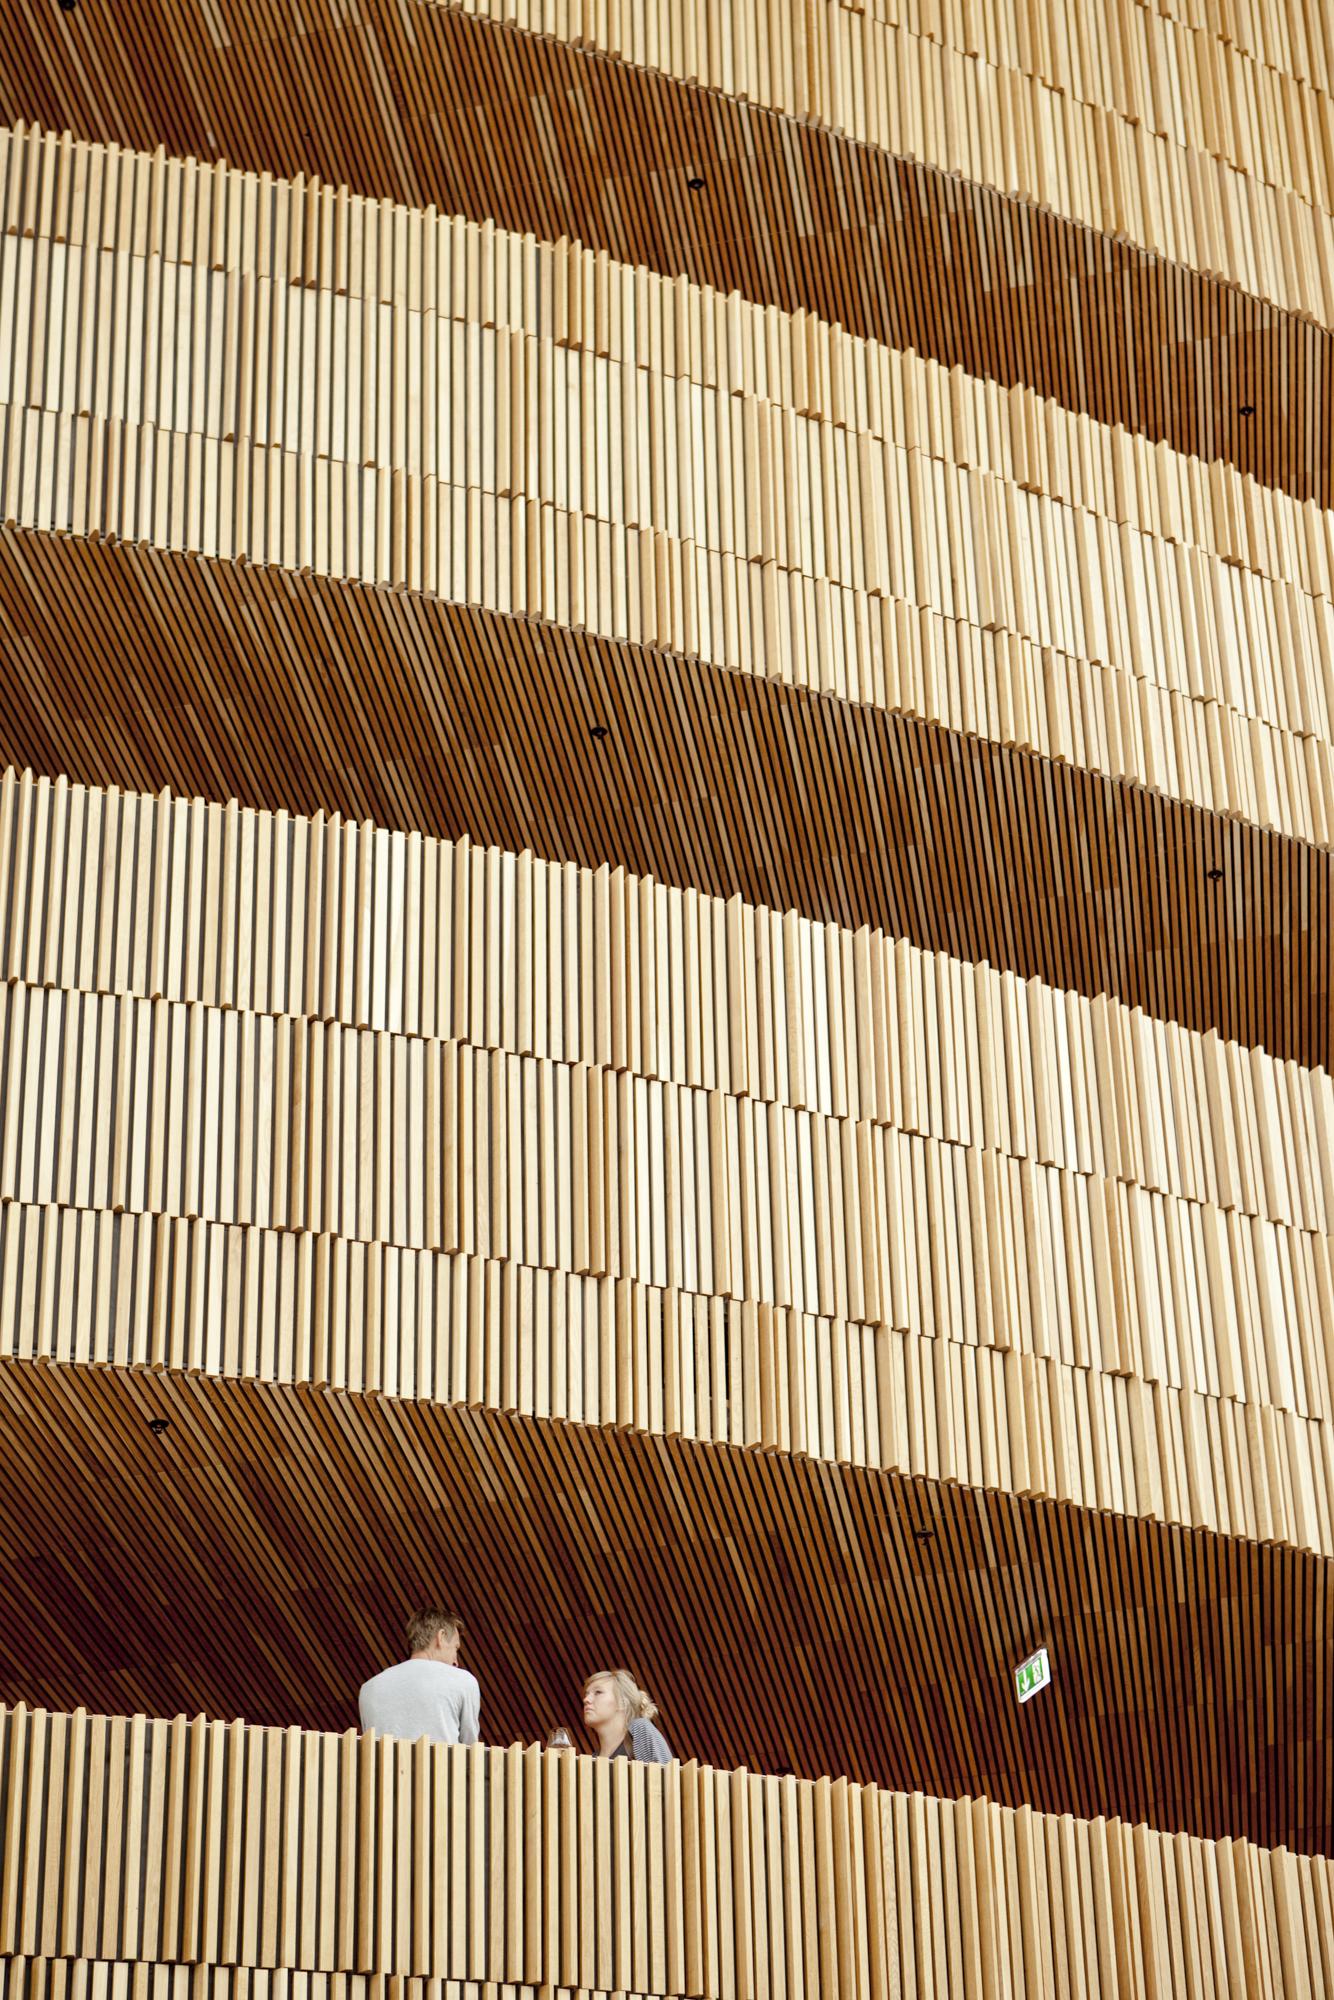 fotografo_interiorismo_arquitectura_Cantabria_10